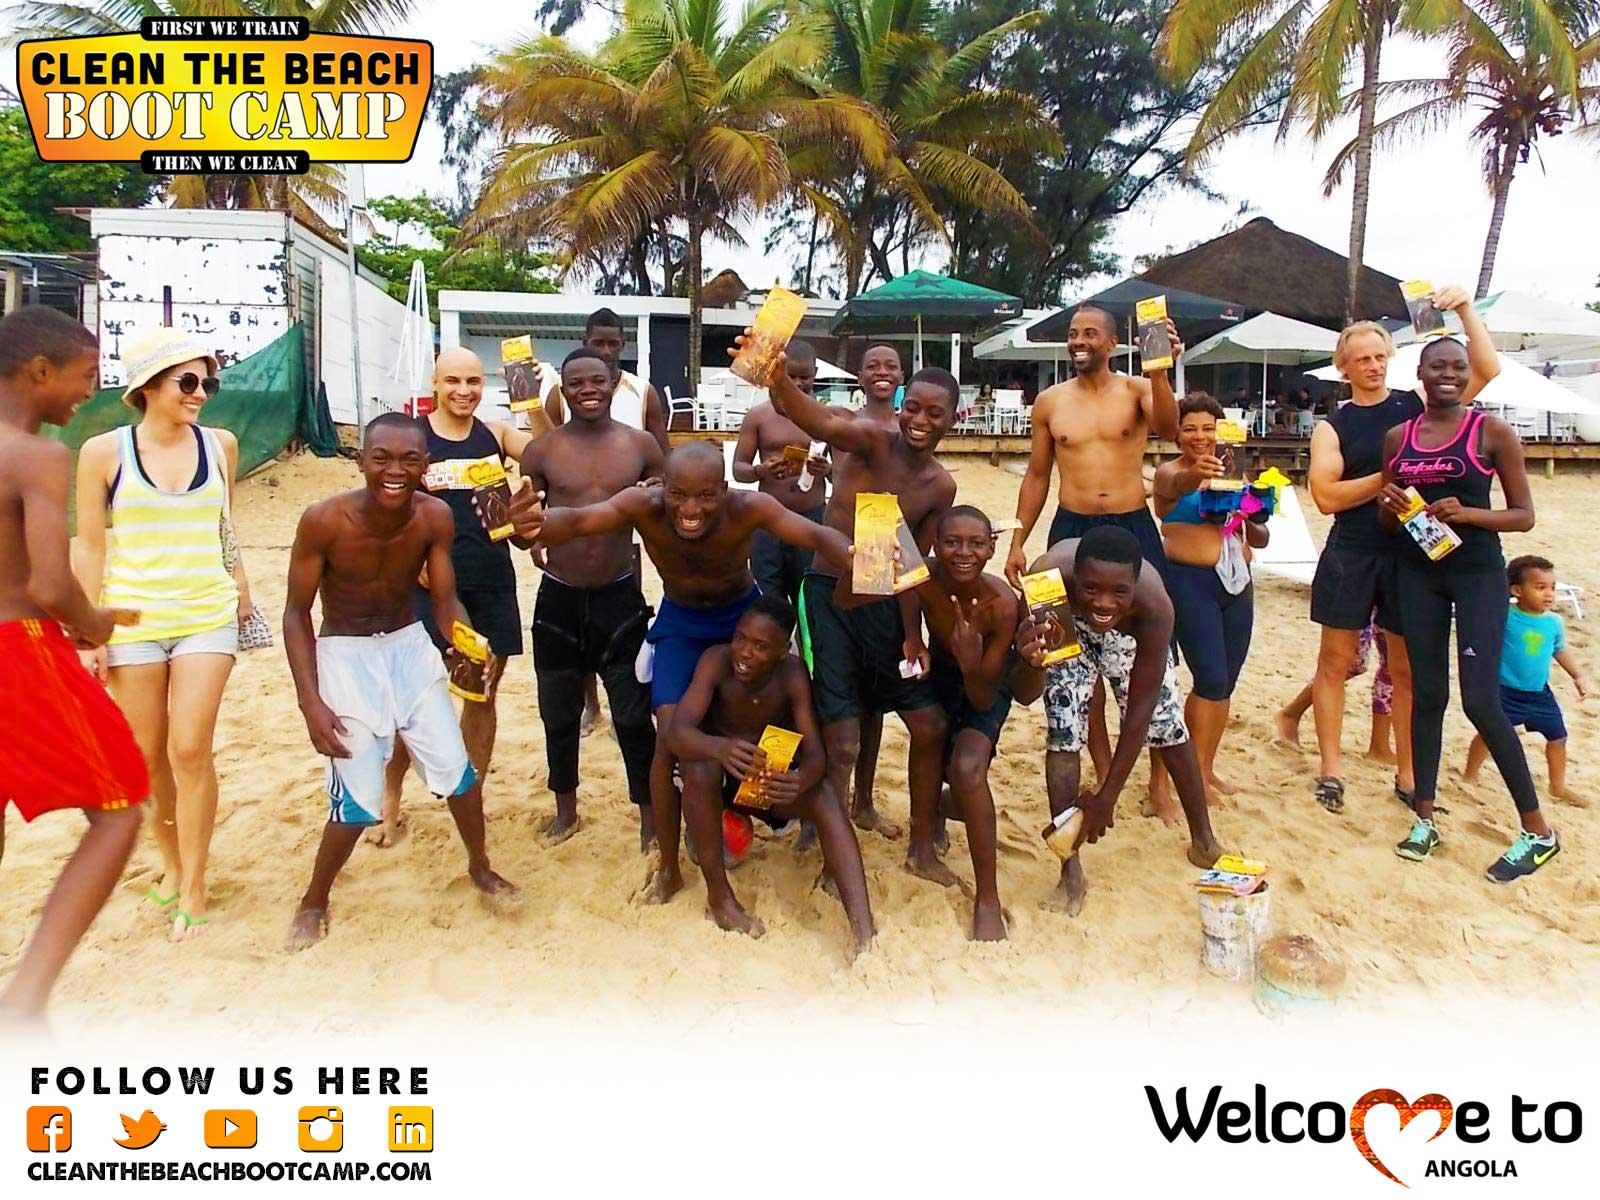 Angola Boot Camp & Angola Beach Clean Up